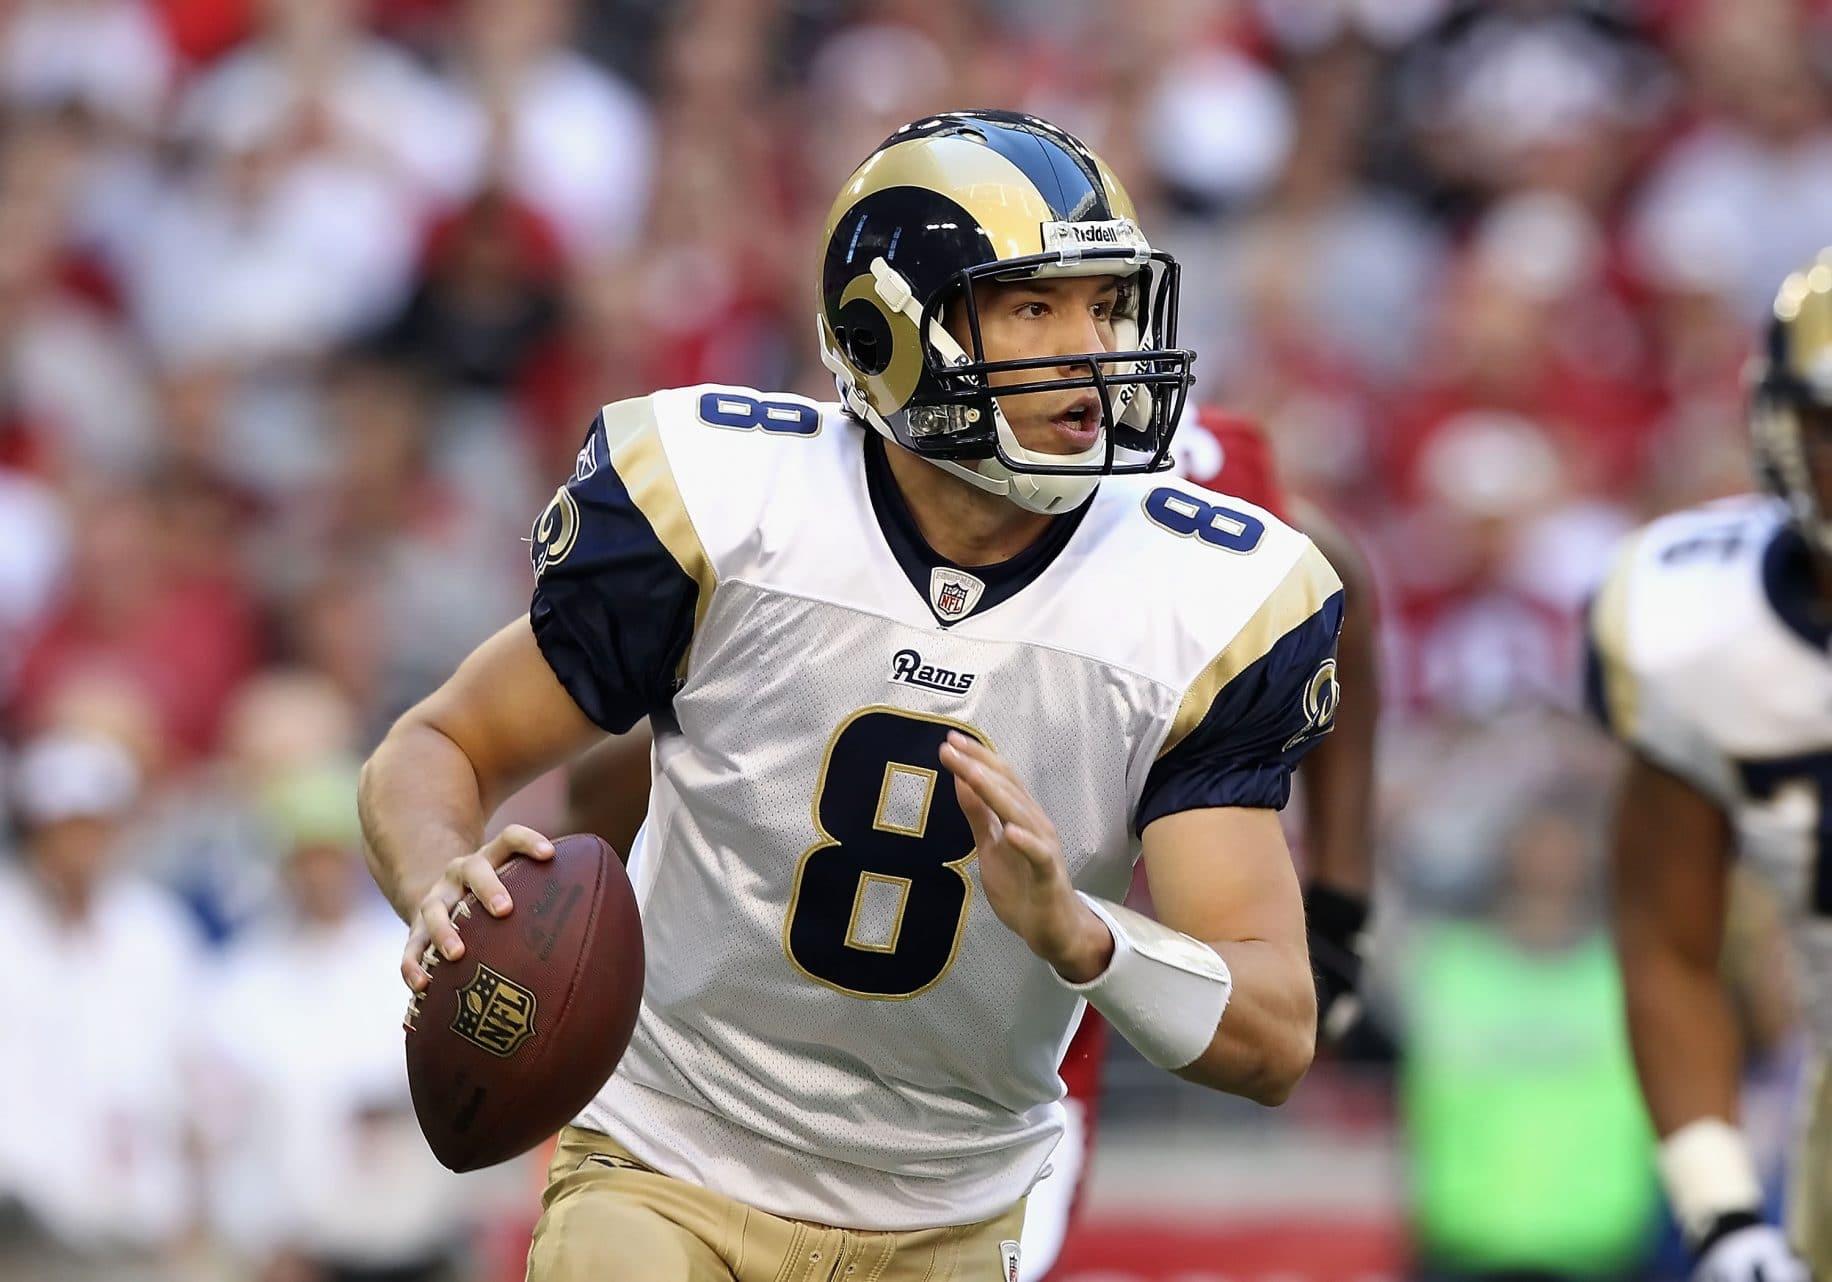 Sam Bradford, St. Louis Rams